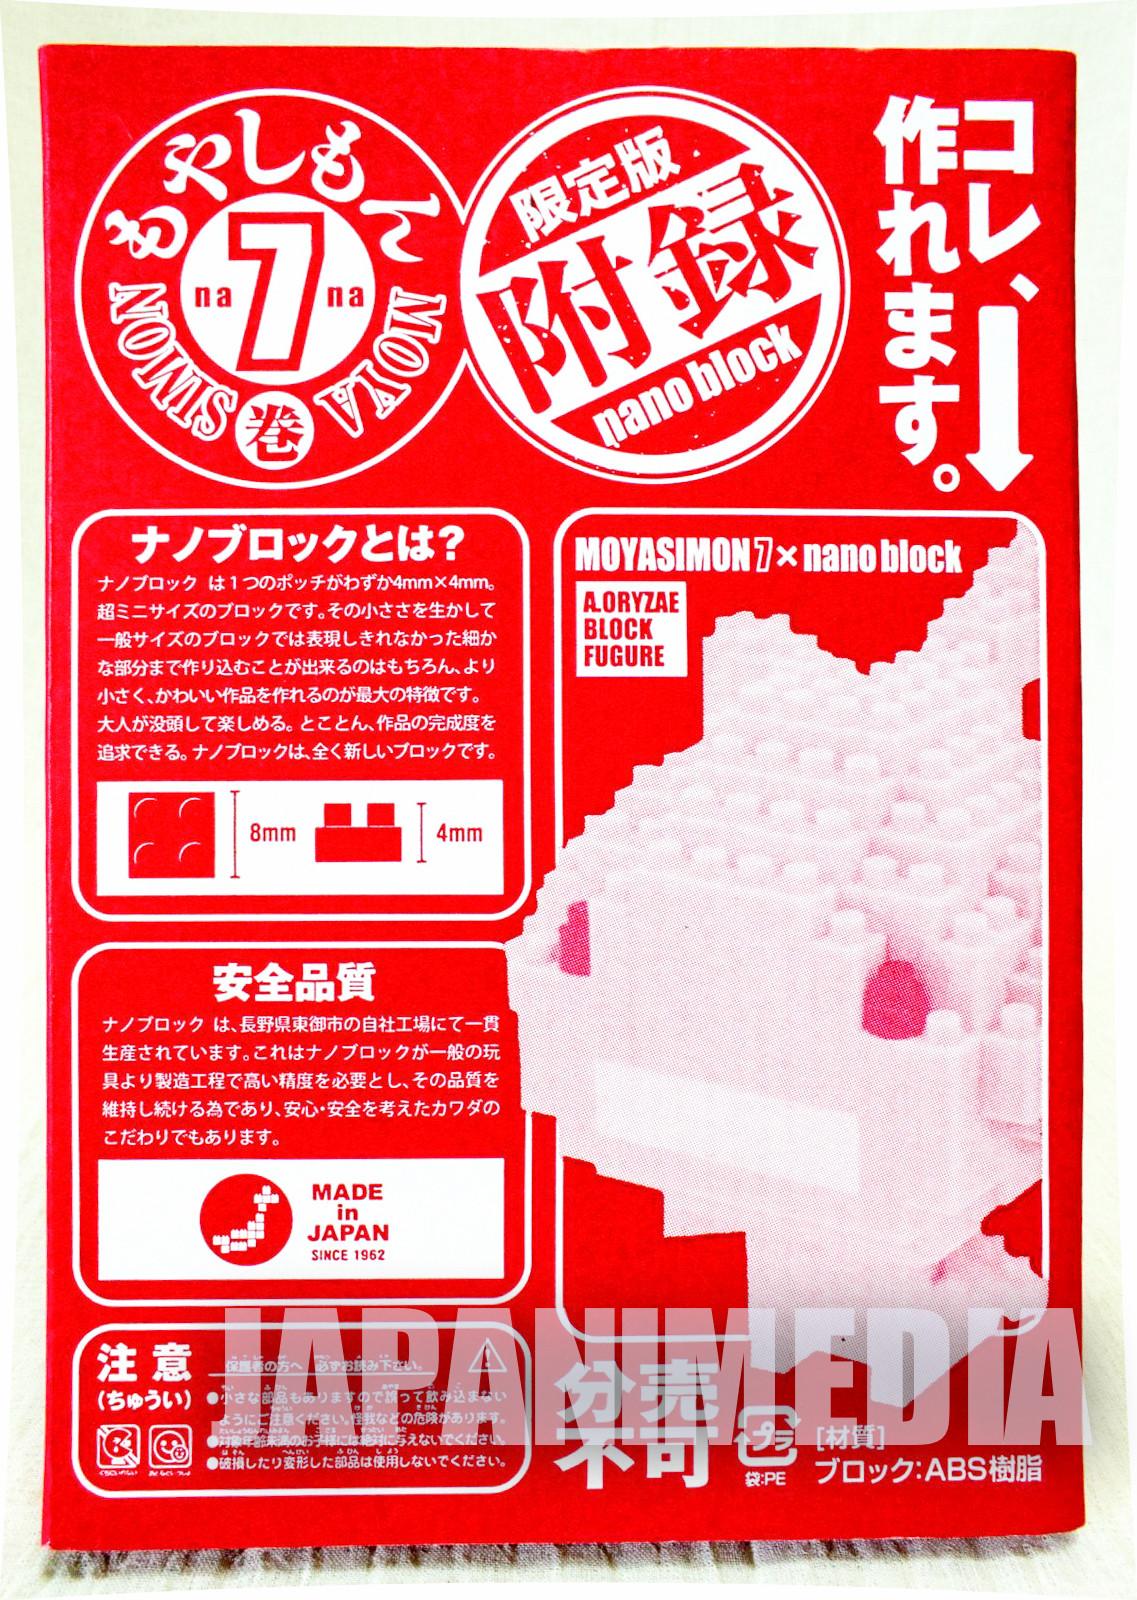 Moyashimon Kawada Nanoblock Nano Block JAPAN FIGURE